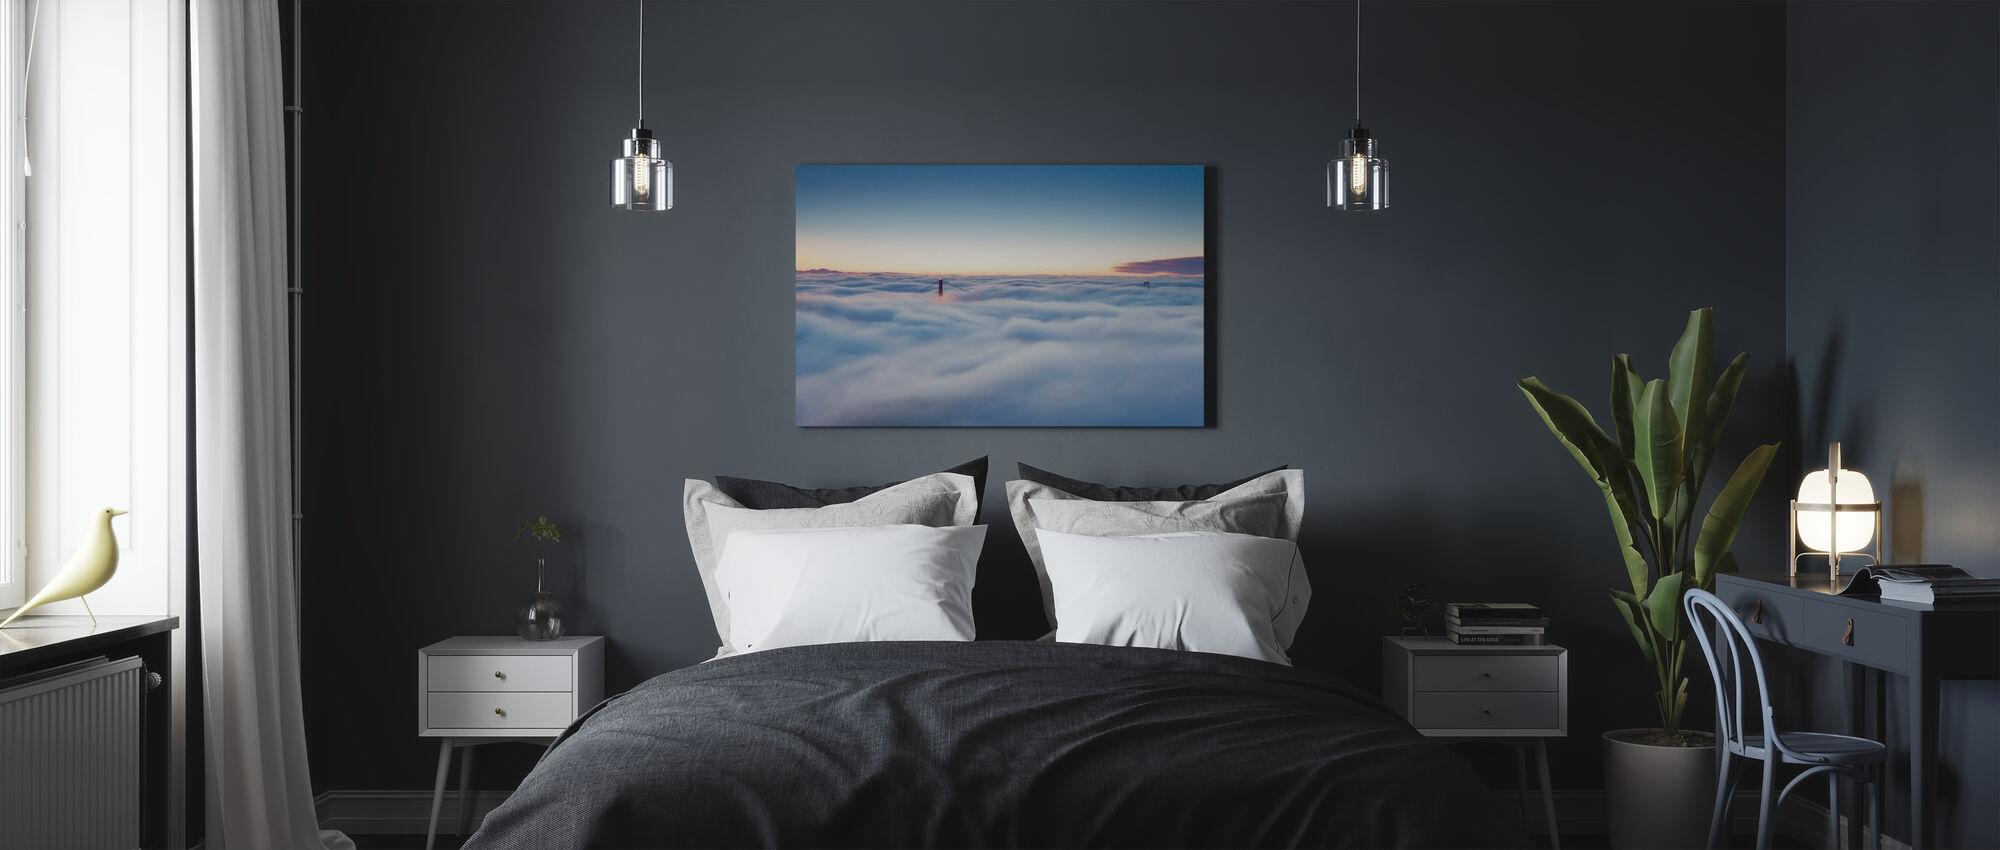 Fog over San Francisco - Canvas print - Bedroom